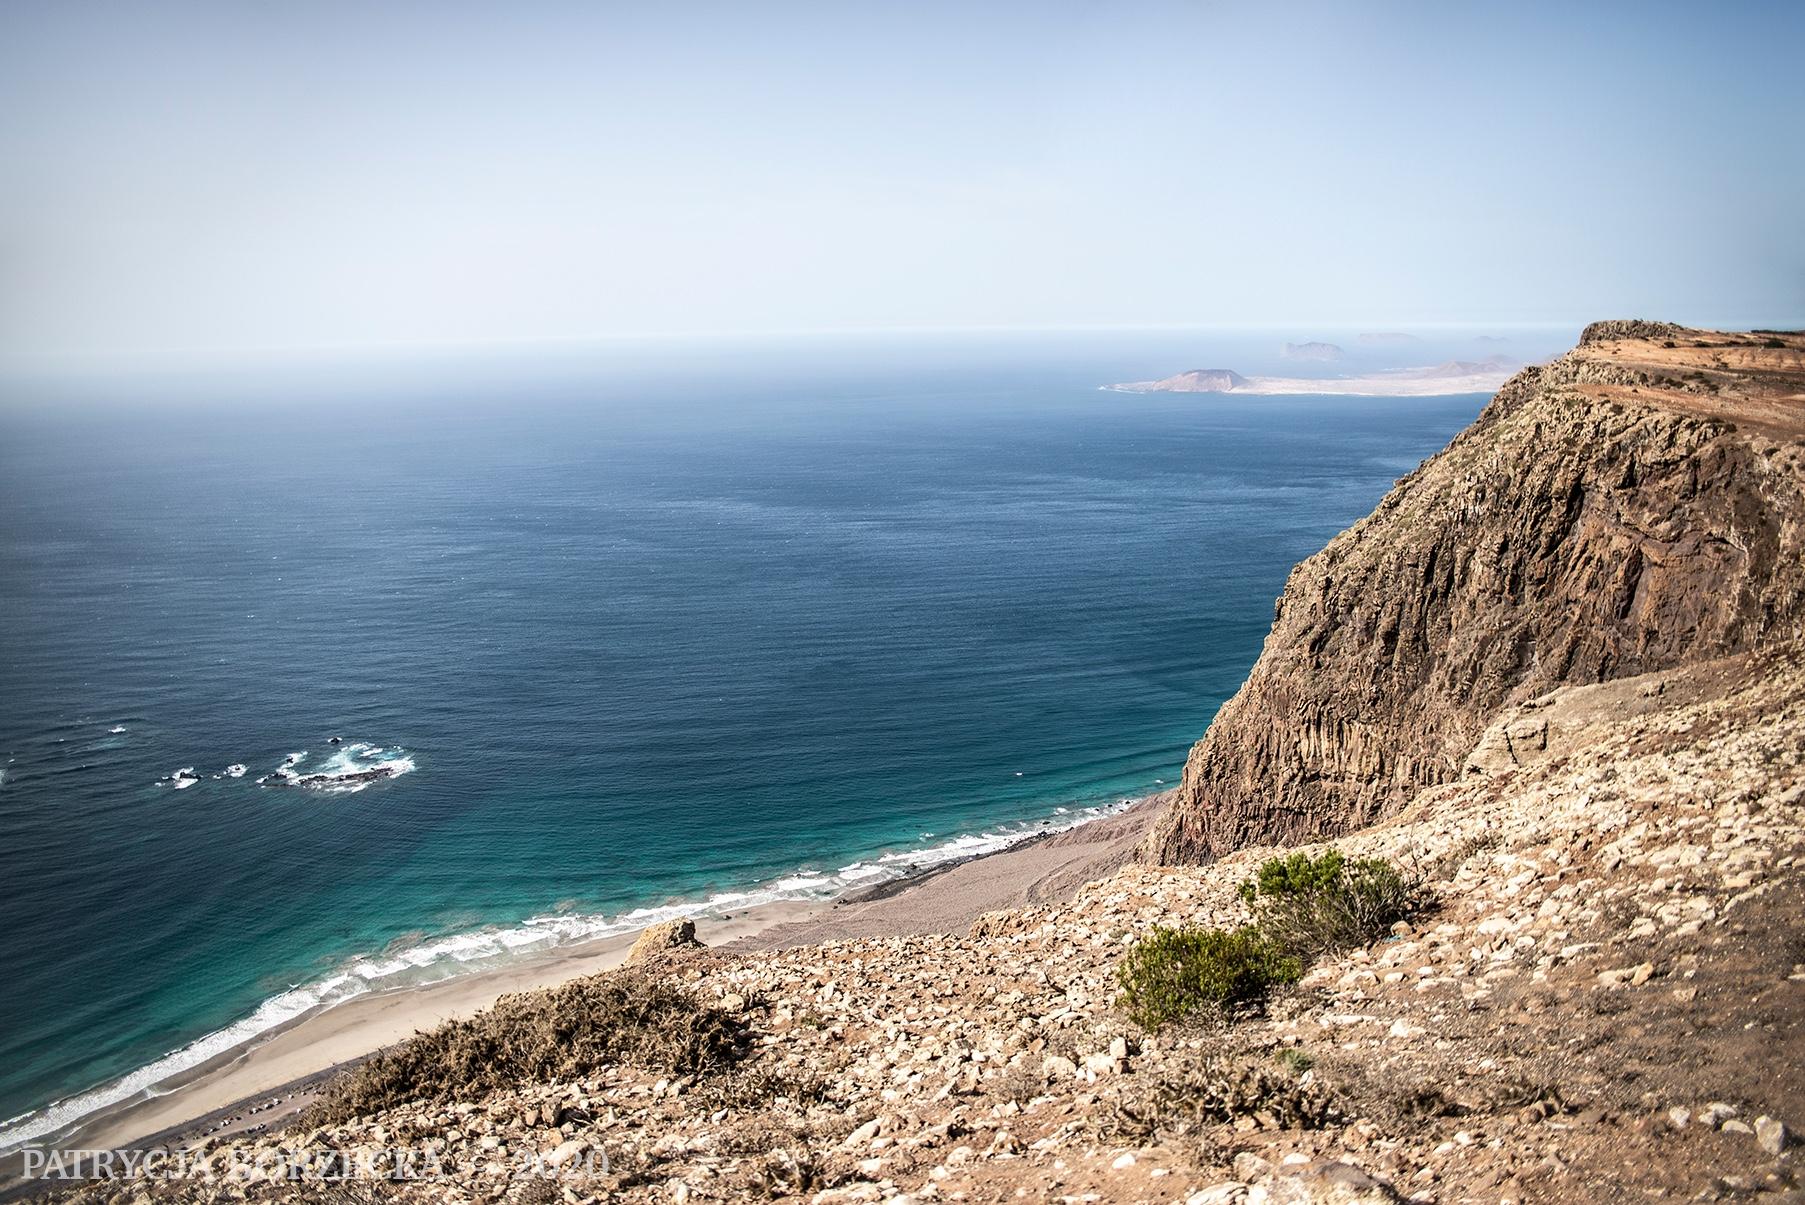 Lanzarote-Mirador-Patrycja-Borzecka-Photo